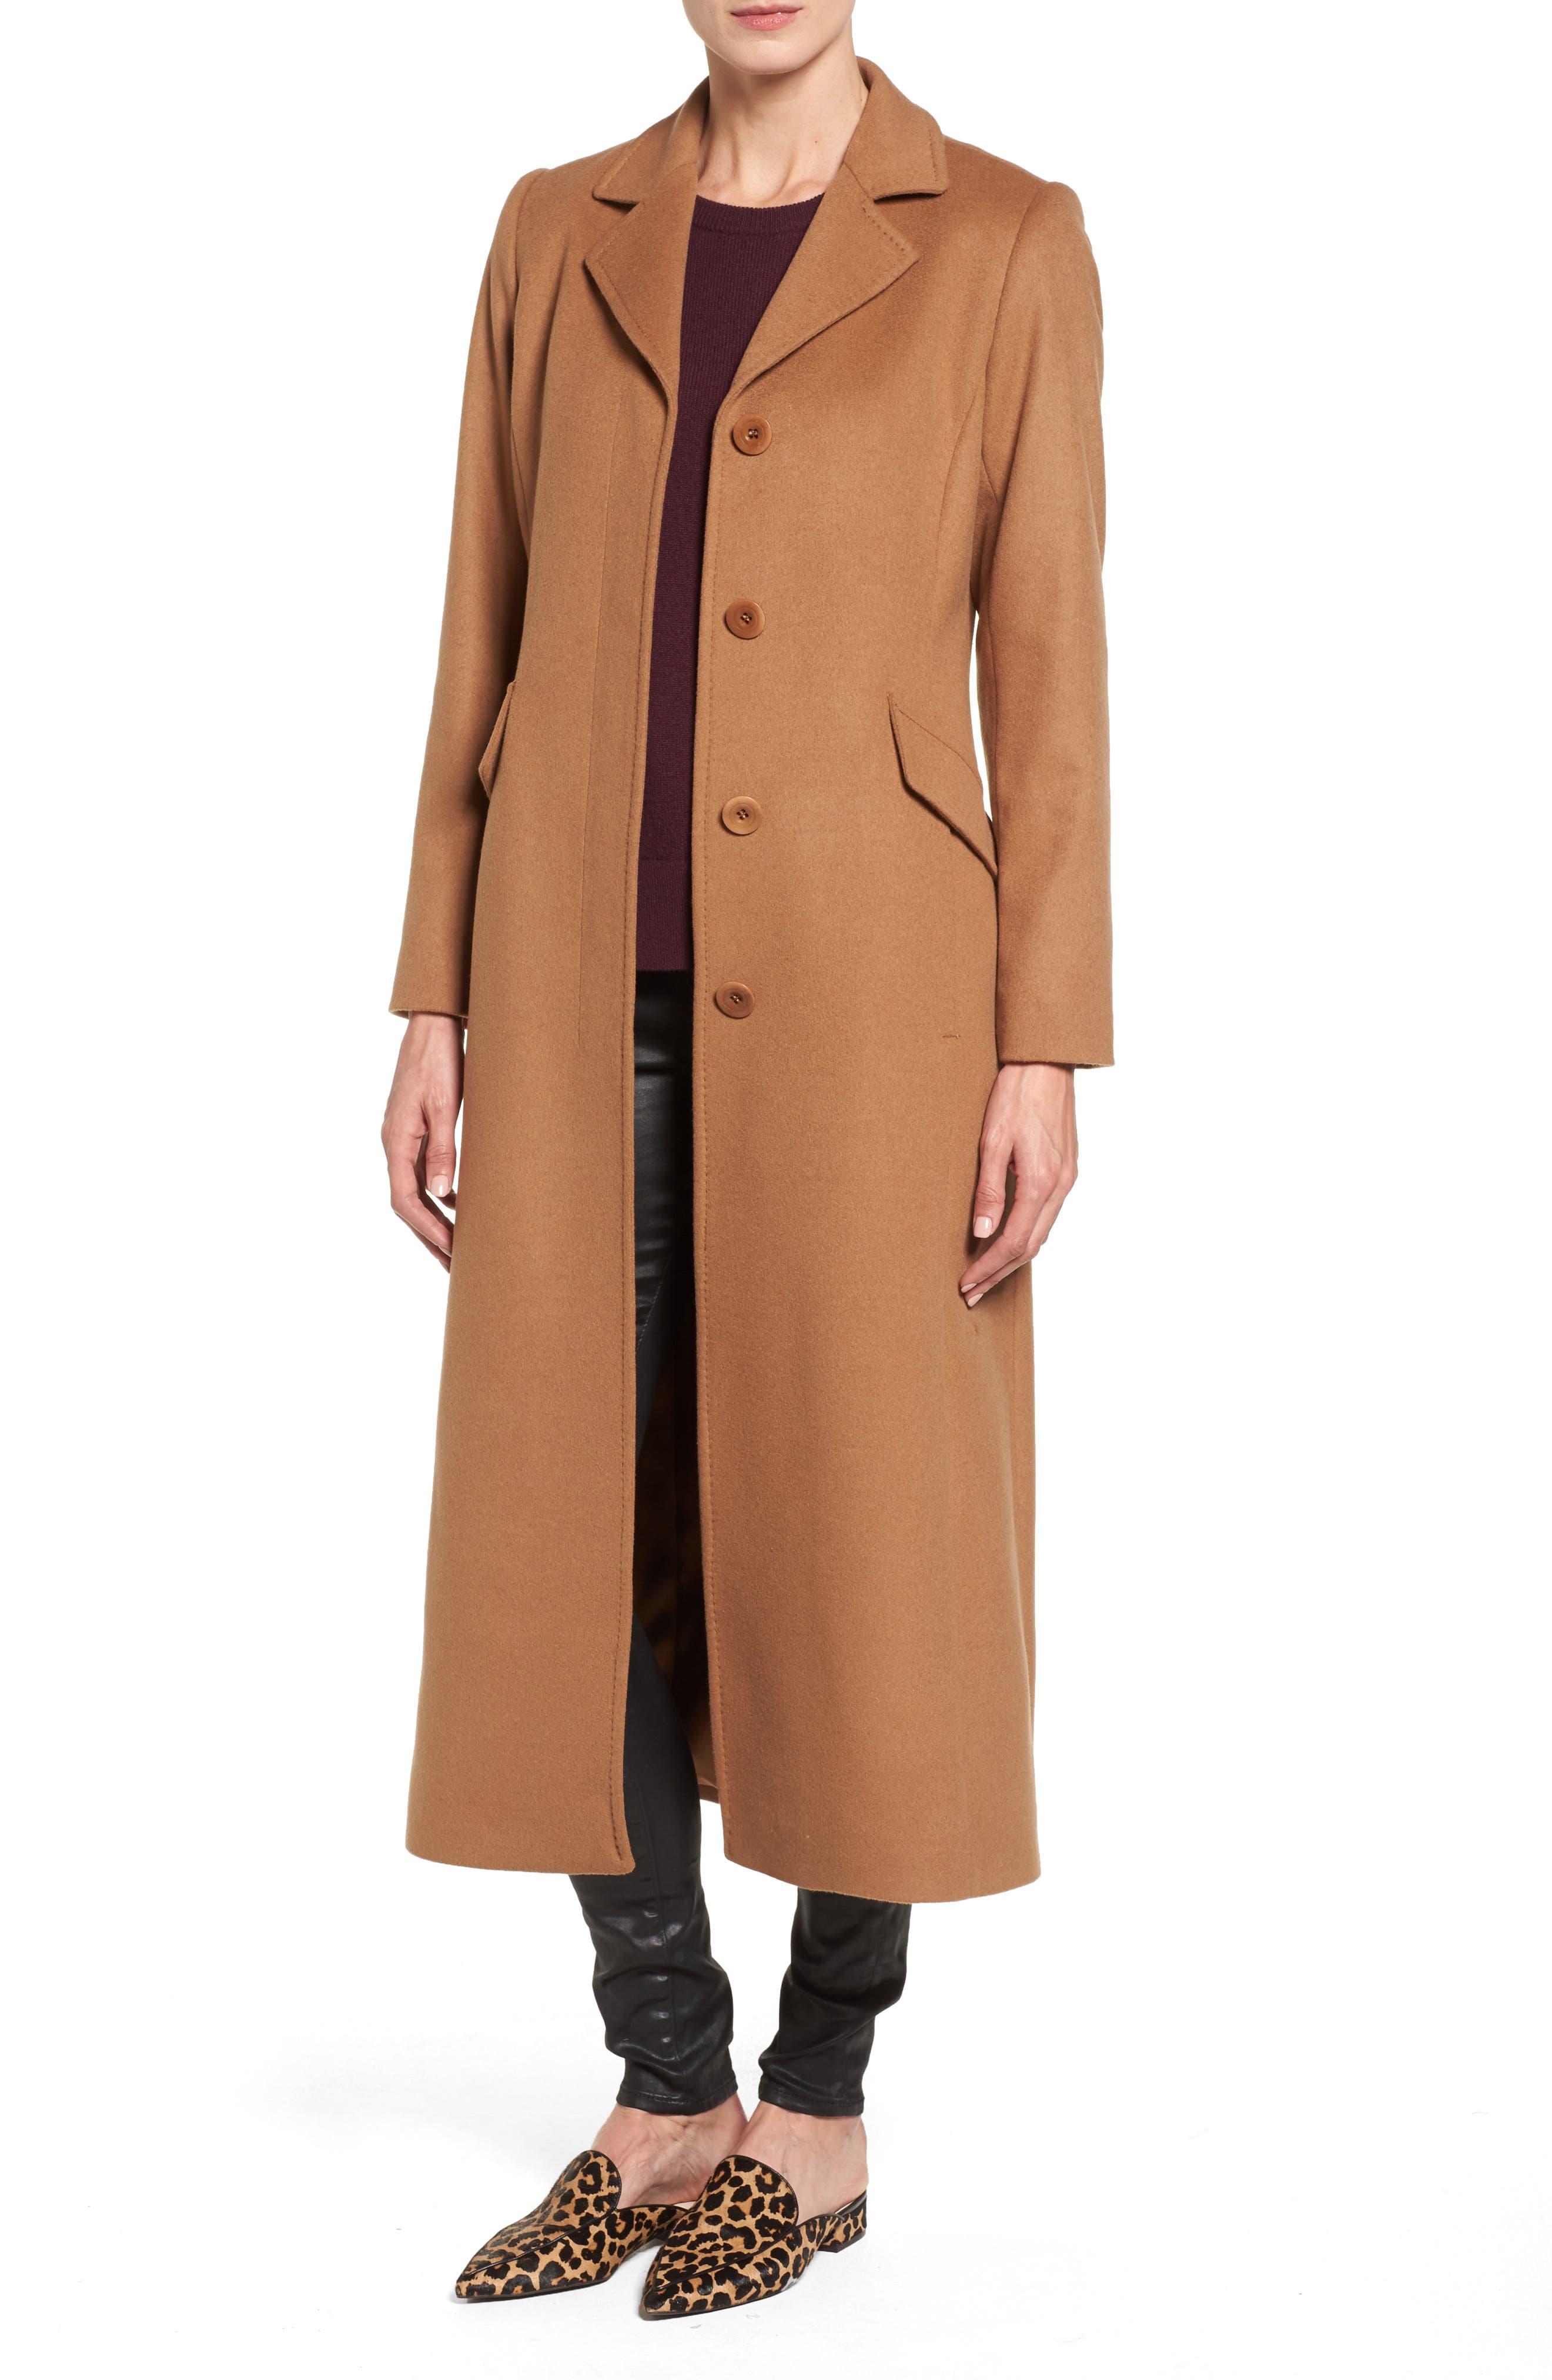 Emi Wool Blend Coat,                         Main,                         color, Camel